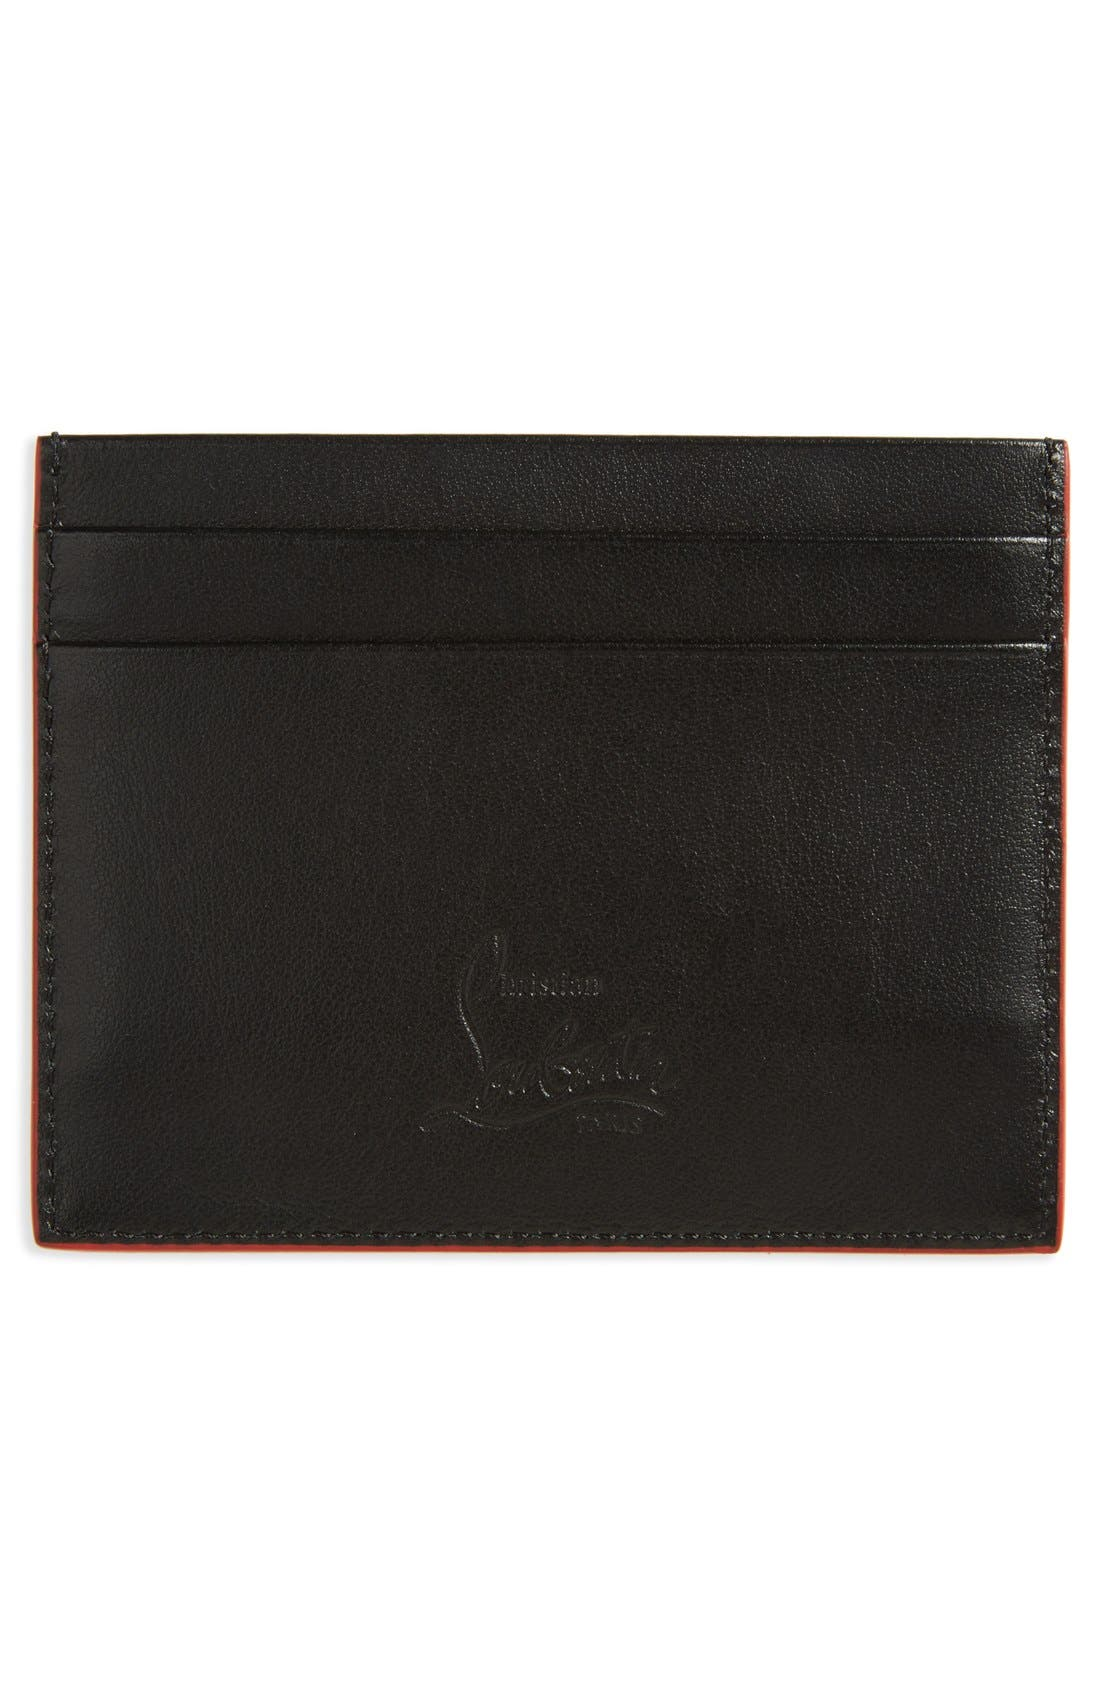 'Kios' Spiked Calfskin Leather Card Case,                             Alternate thumbnail 2, color,